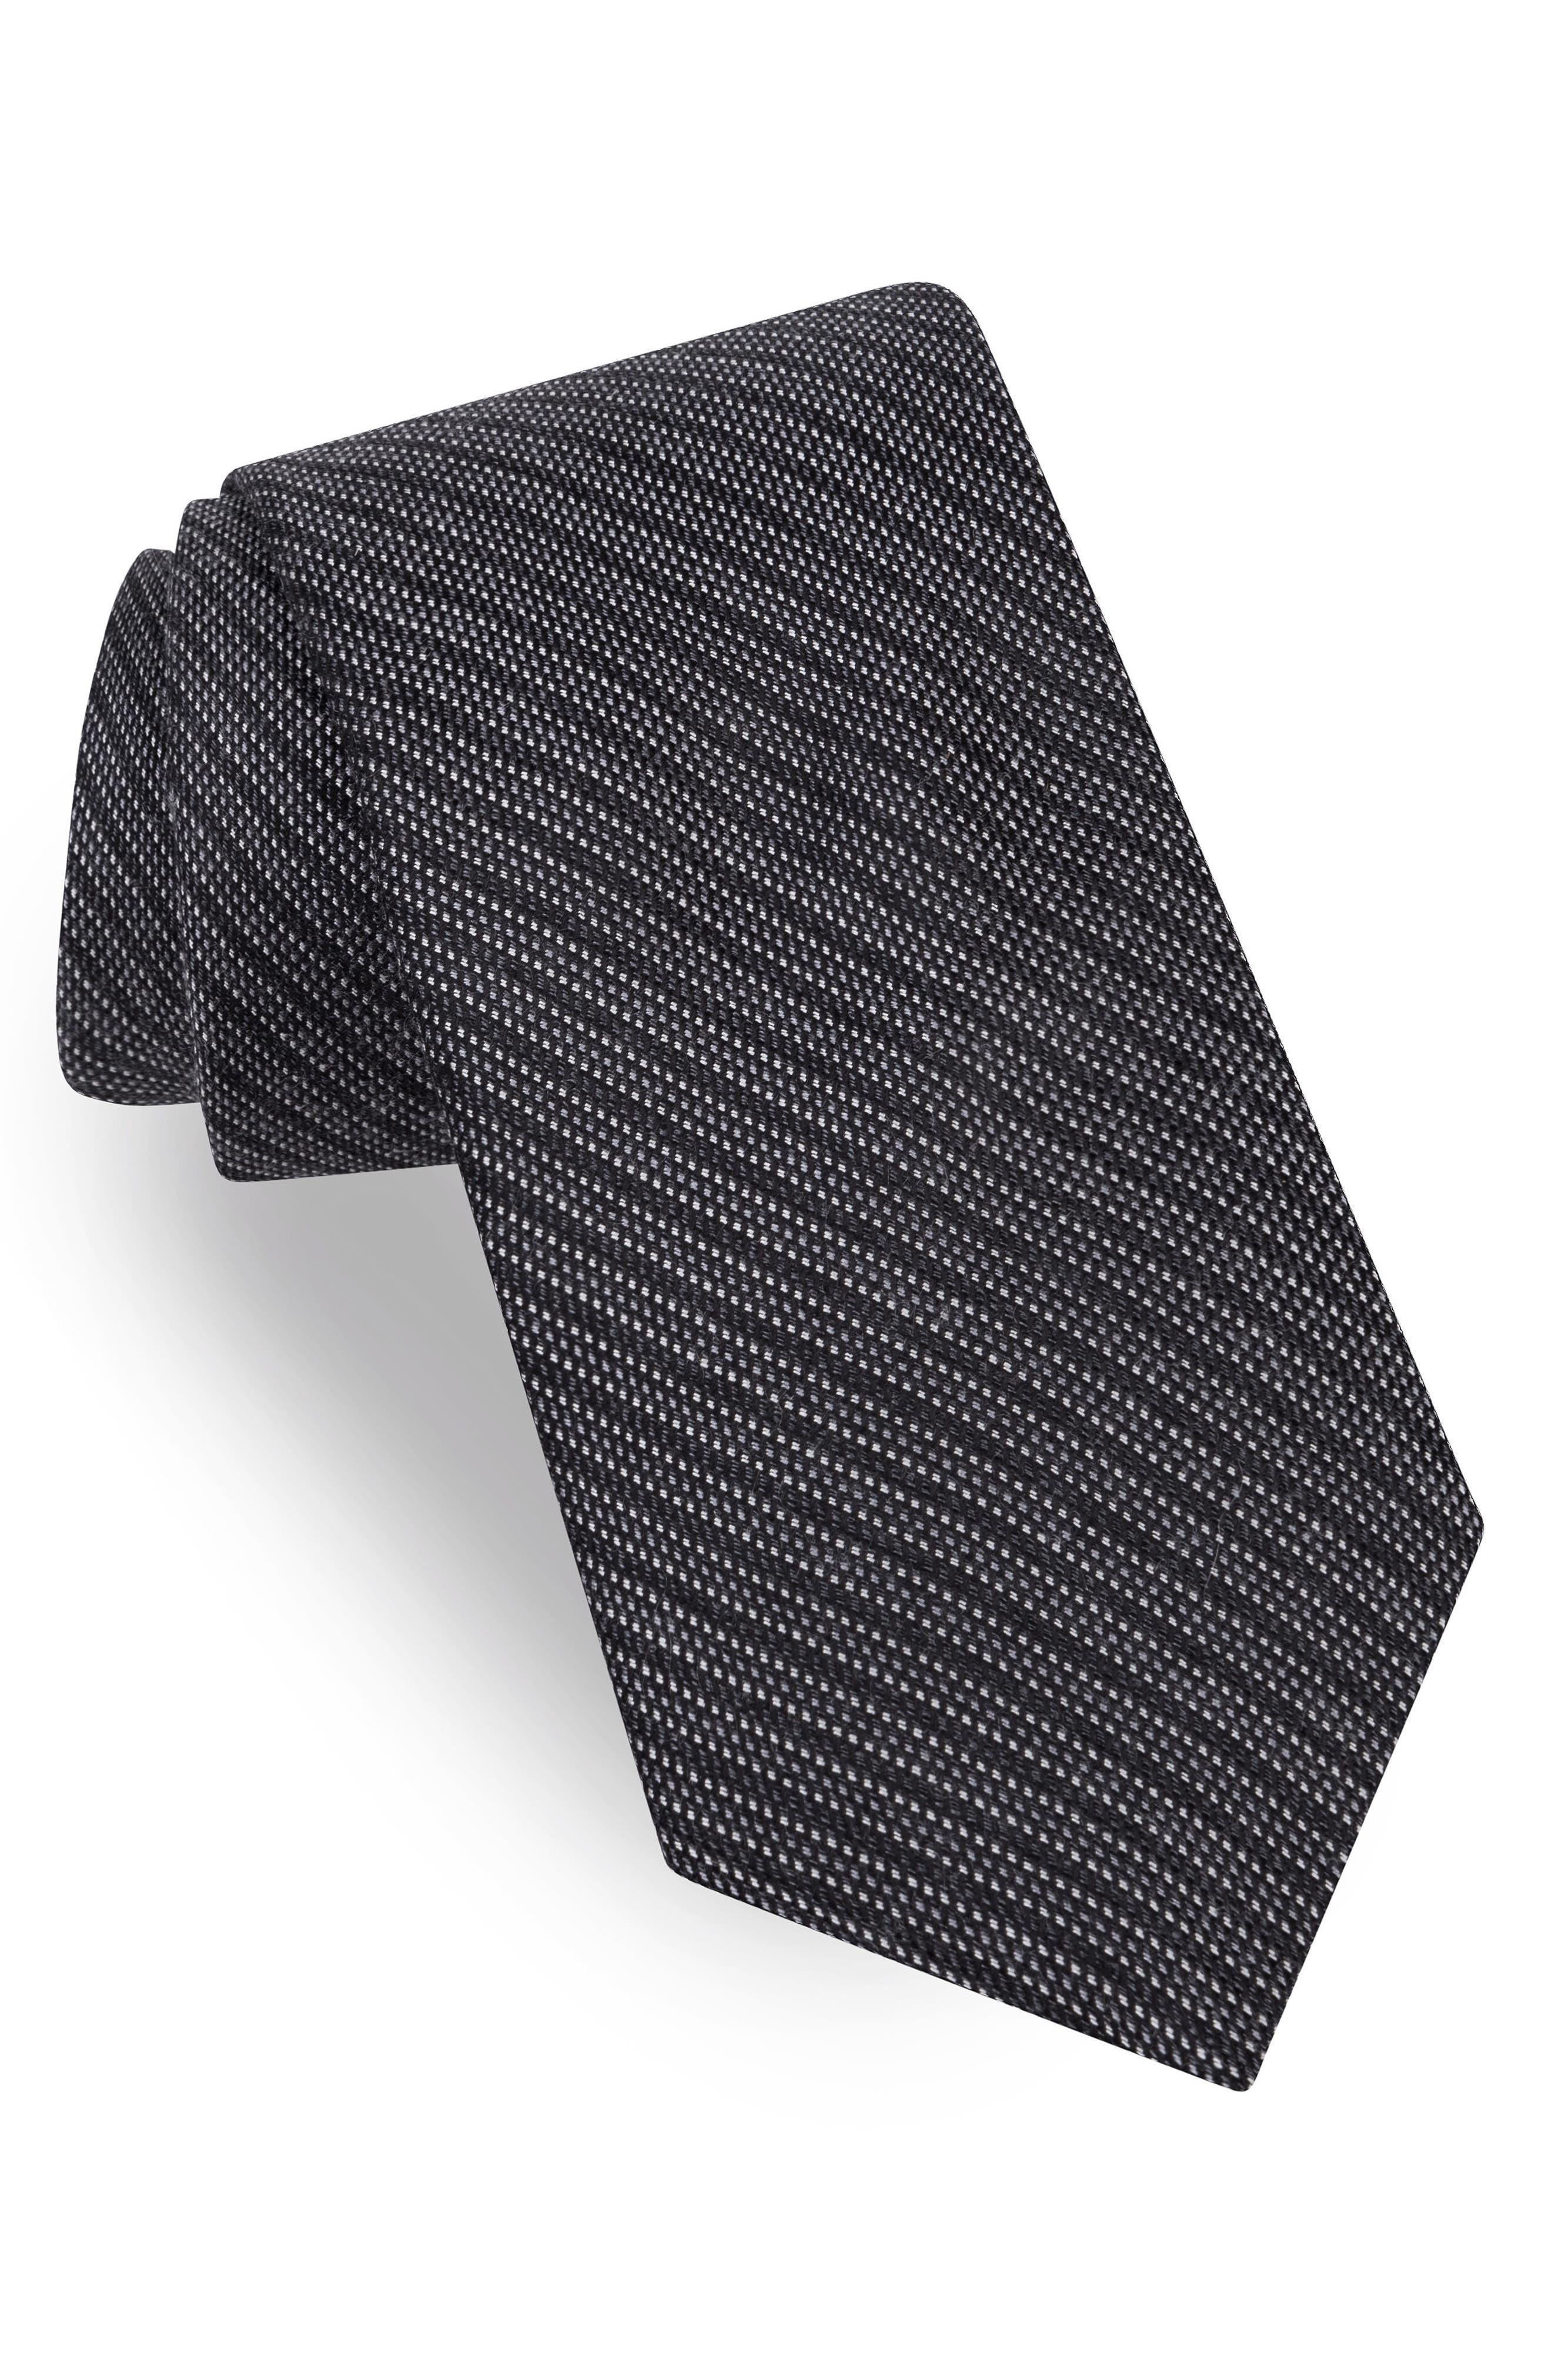 Alternate Image 1 Selected - Ted Baker London West End Wardrobe Silk Tie